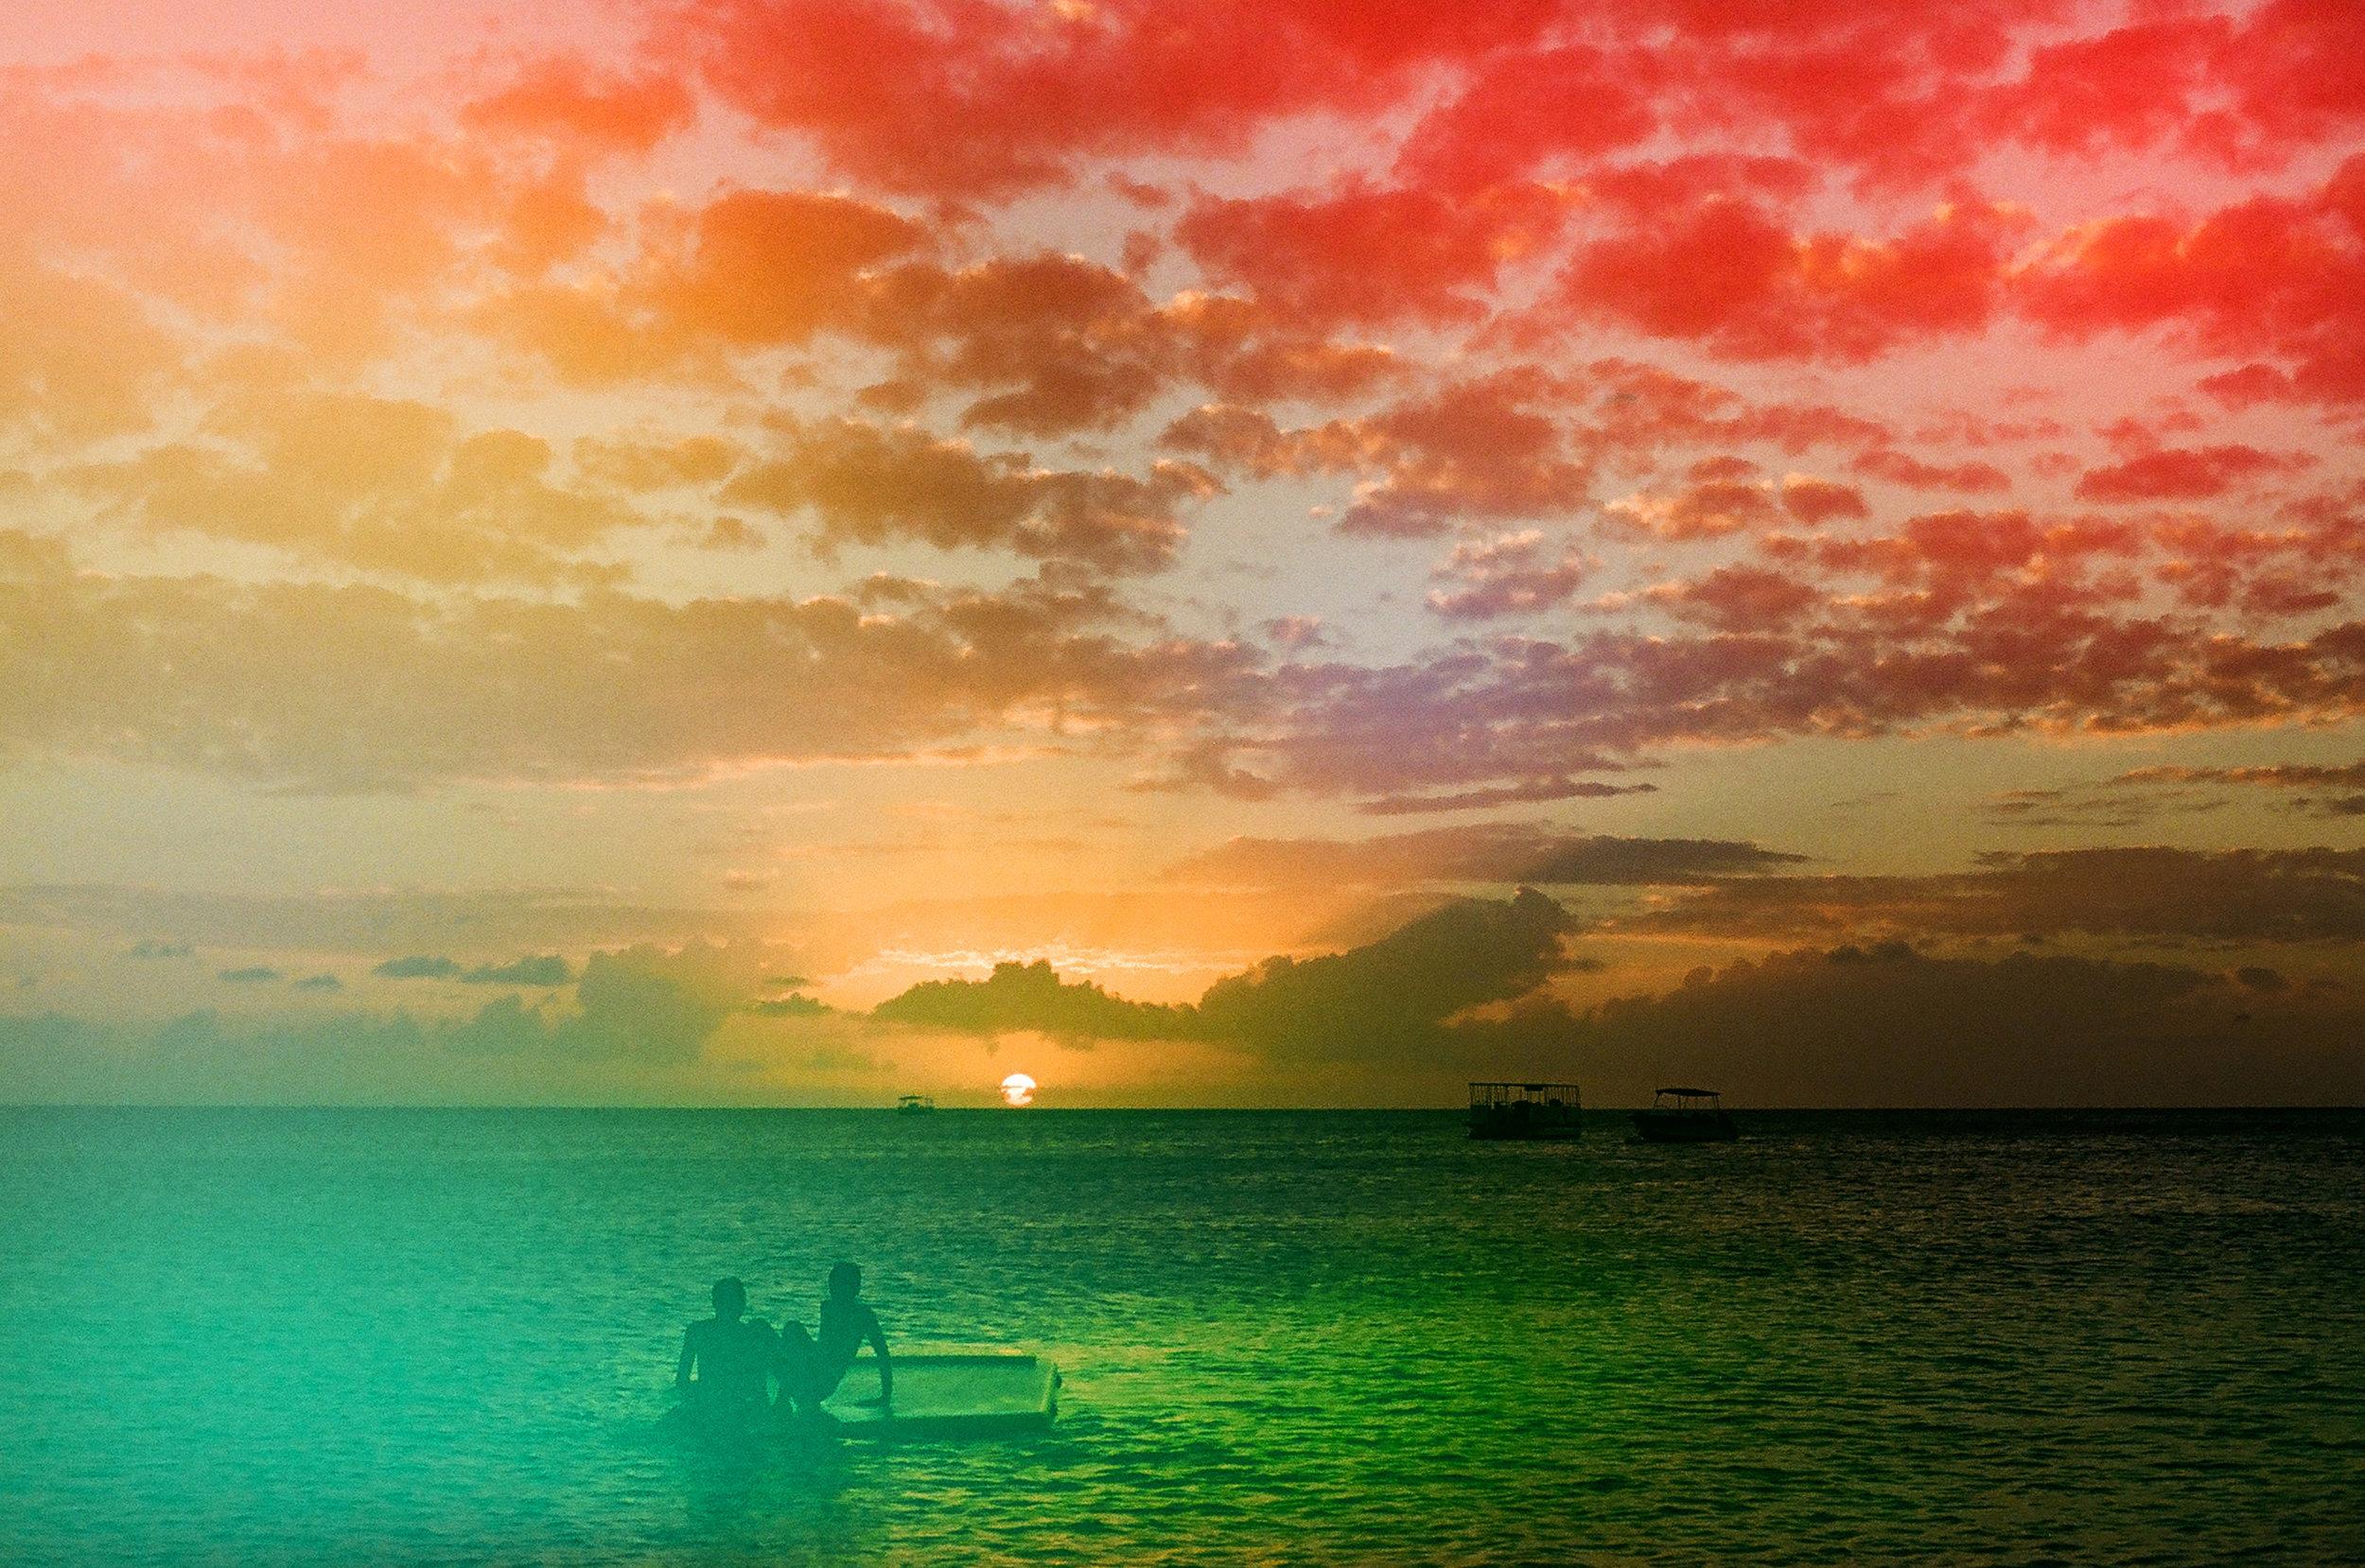 cayman islands 2019